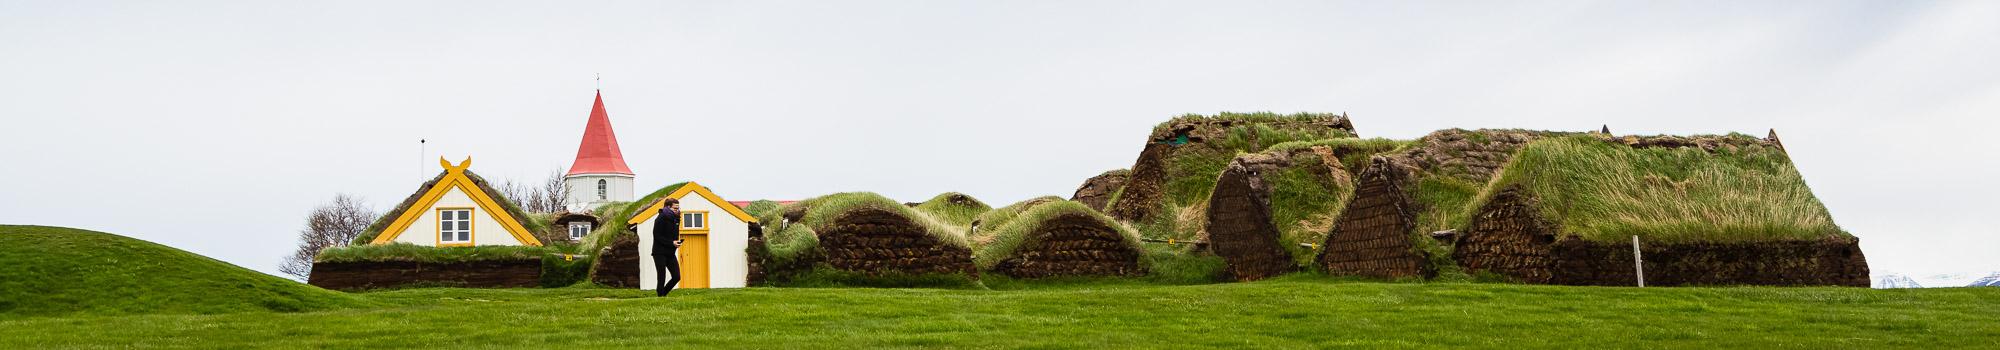 Glaumbaer museum Turf Houses in Iceland